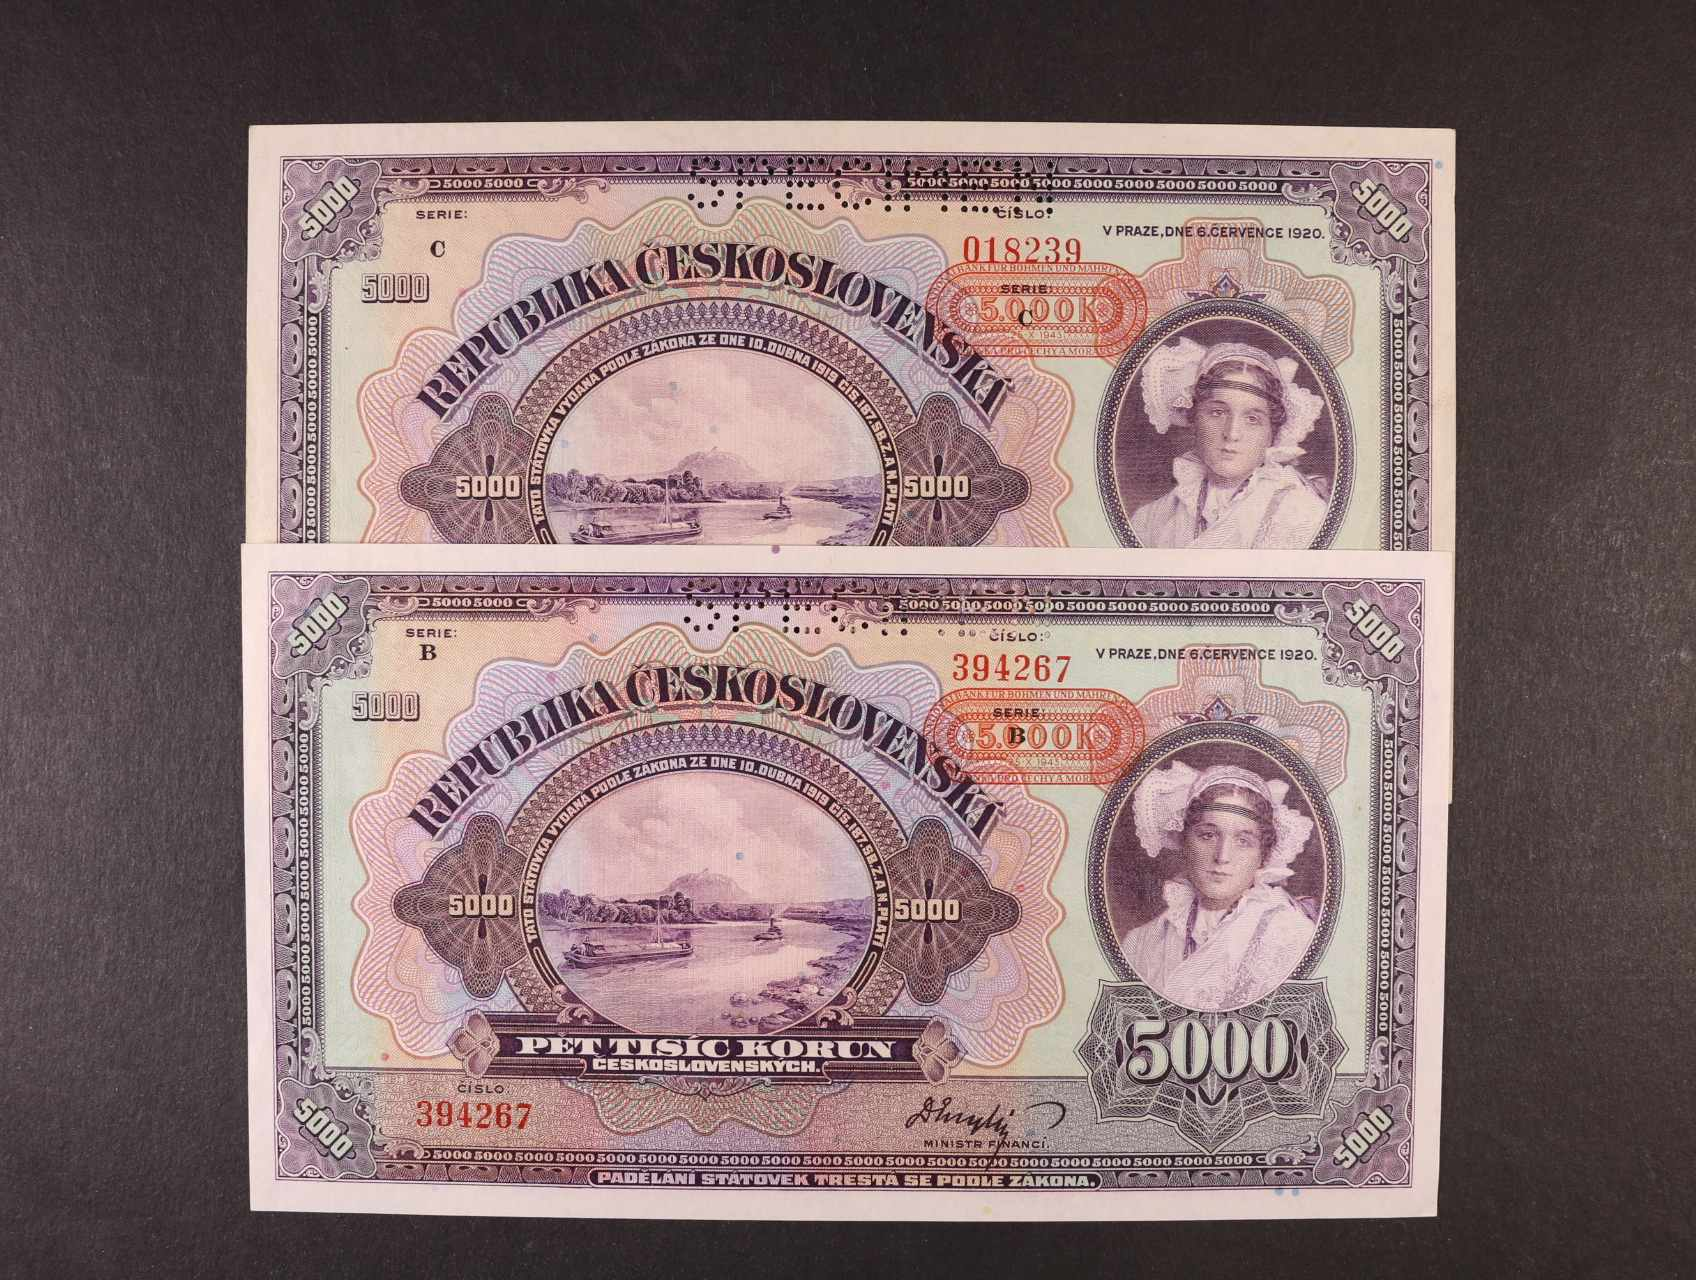 5000 K 6.7.1920 s přetiskem 25.10.1943 série B, C nevydaná, perf. SPECIMEN, Ba. N3, Pi. 16, 2ks